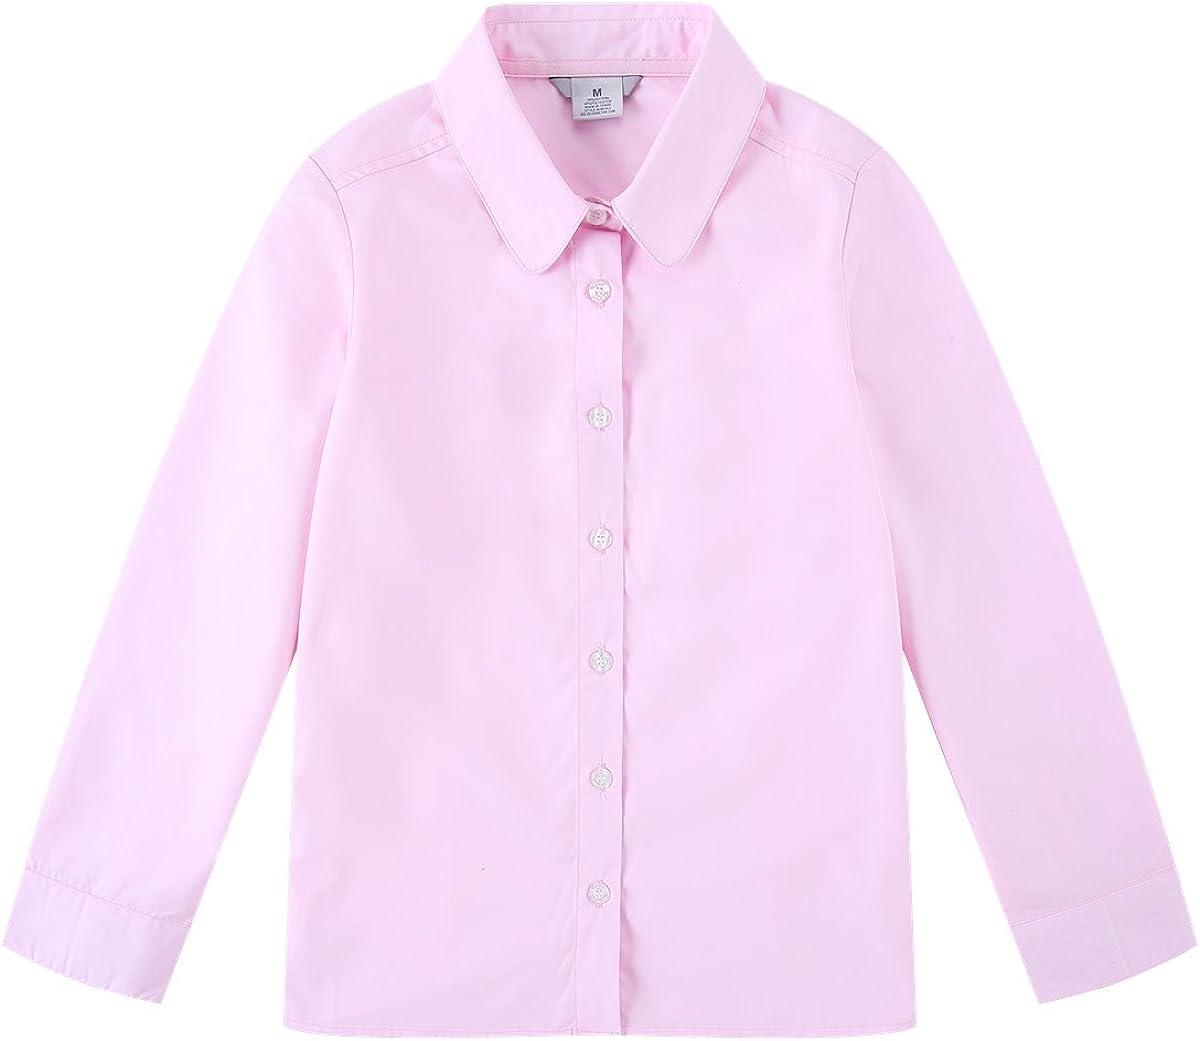 Bienzoe Big Girl's School Uniforms Oxford Long Sleeve Blouse: Clothing